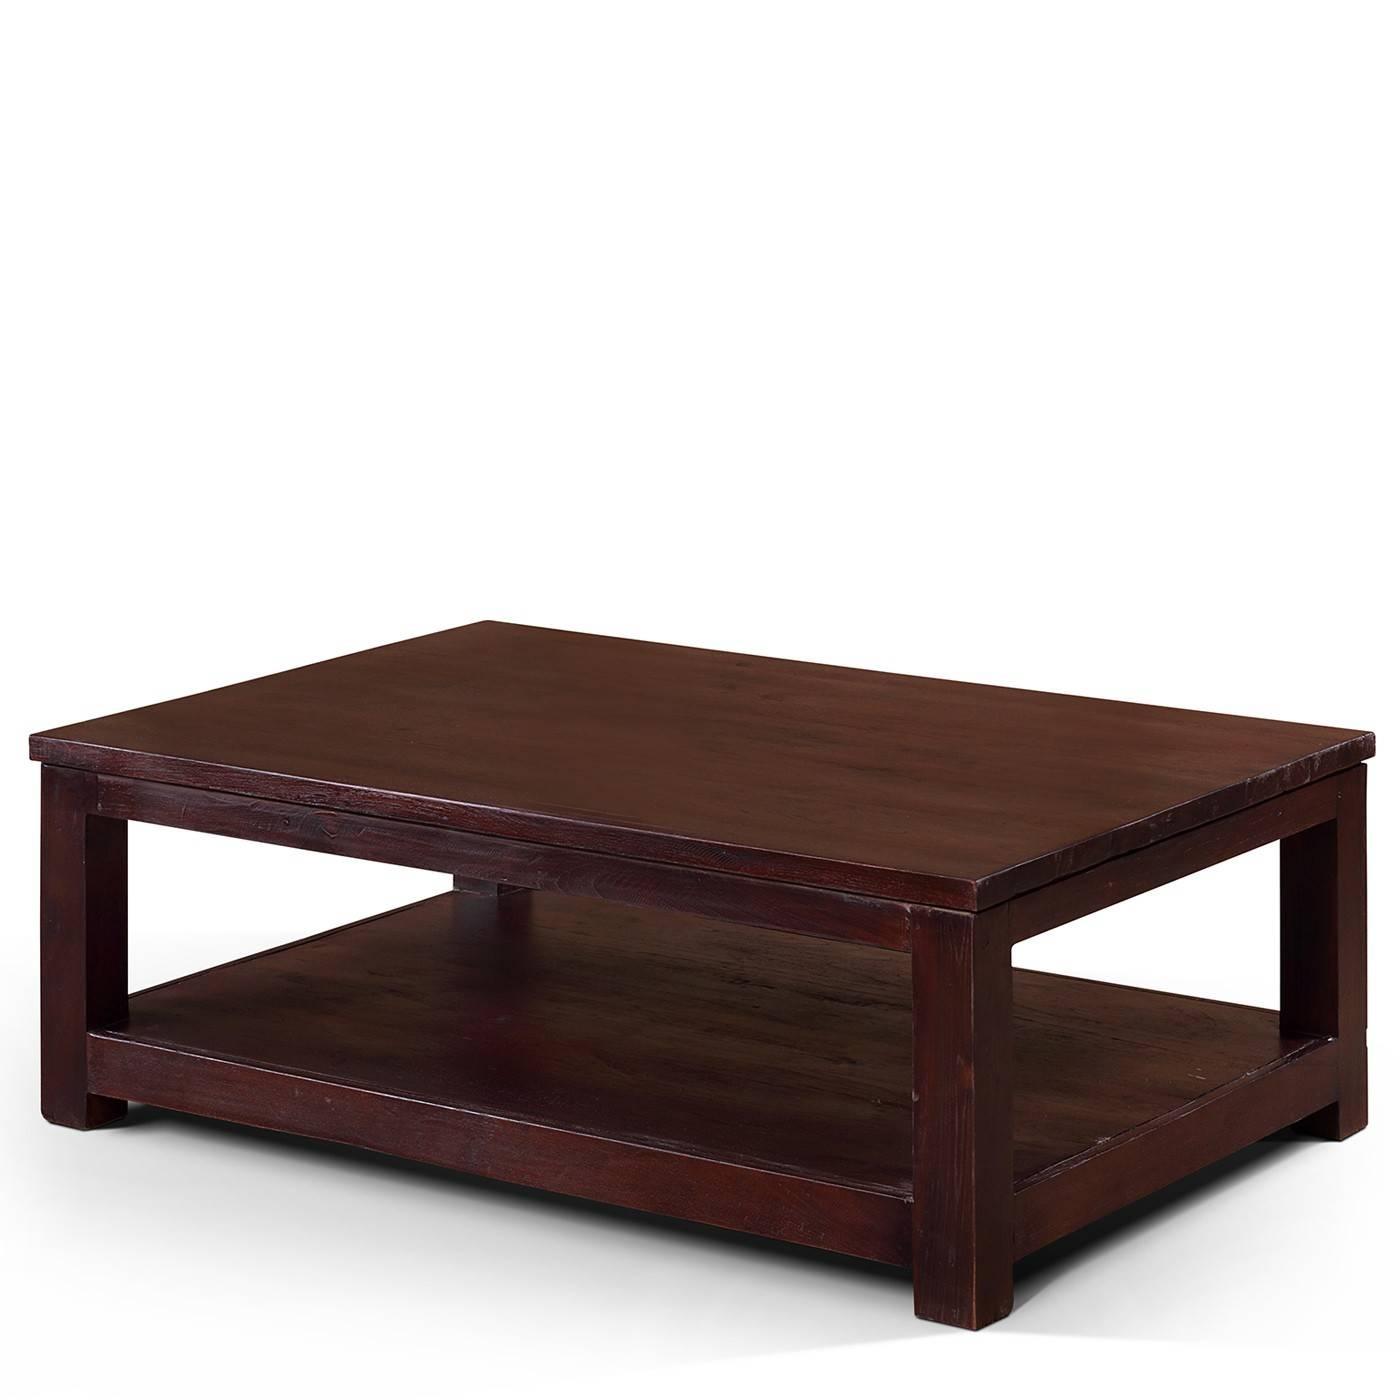 Masculine Dark Wood Coffee Table – Square Dark Wood Coffee Tables intended for Dark Mango Coffee Tables (Image 24 of 30)